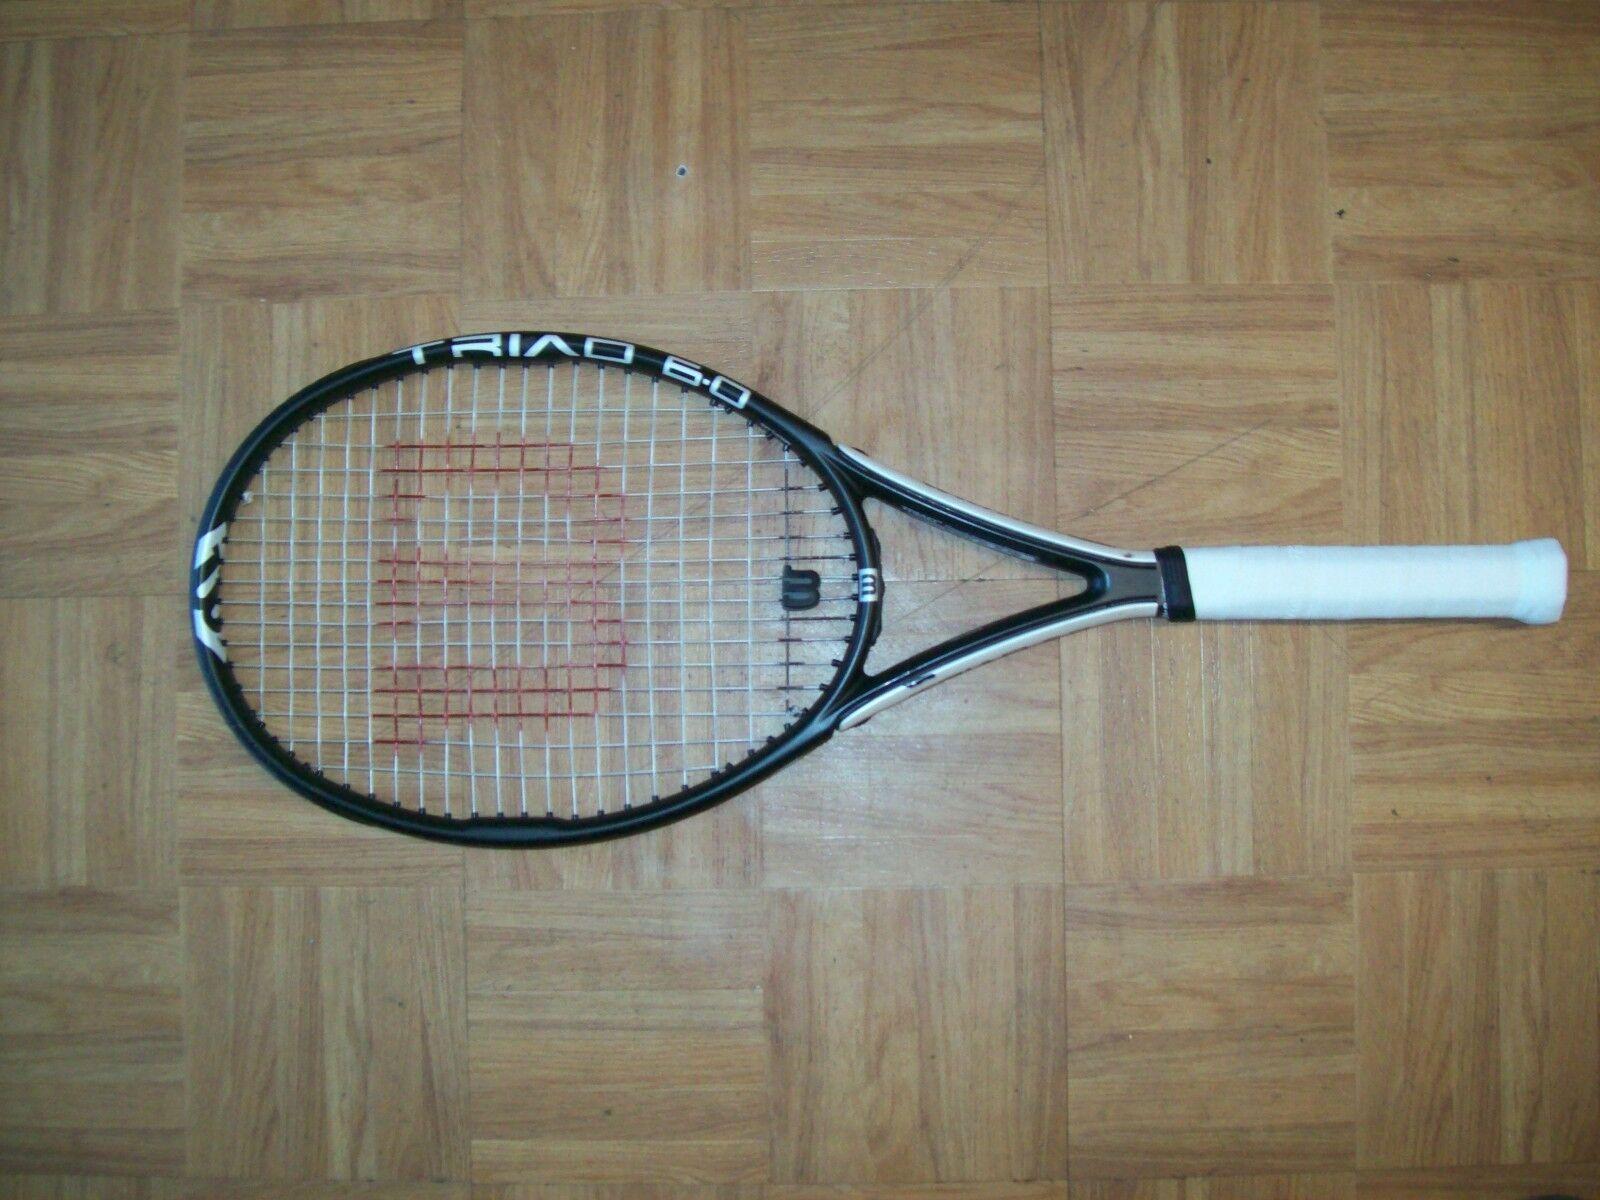 Wilson Triad Pro Staff 6.0 Midplus  95 4 3 8 Grip Tenis Raqueta  respuestas rápidas